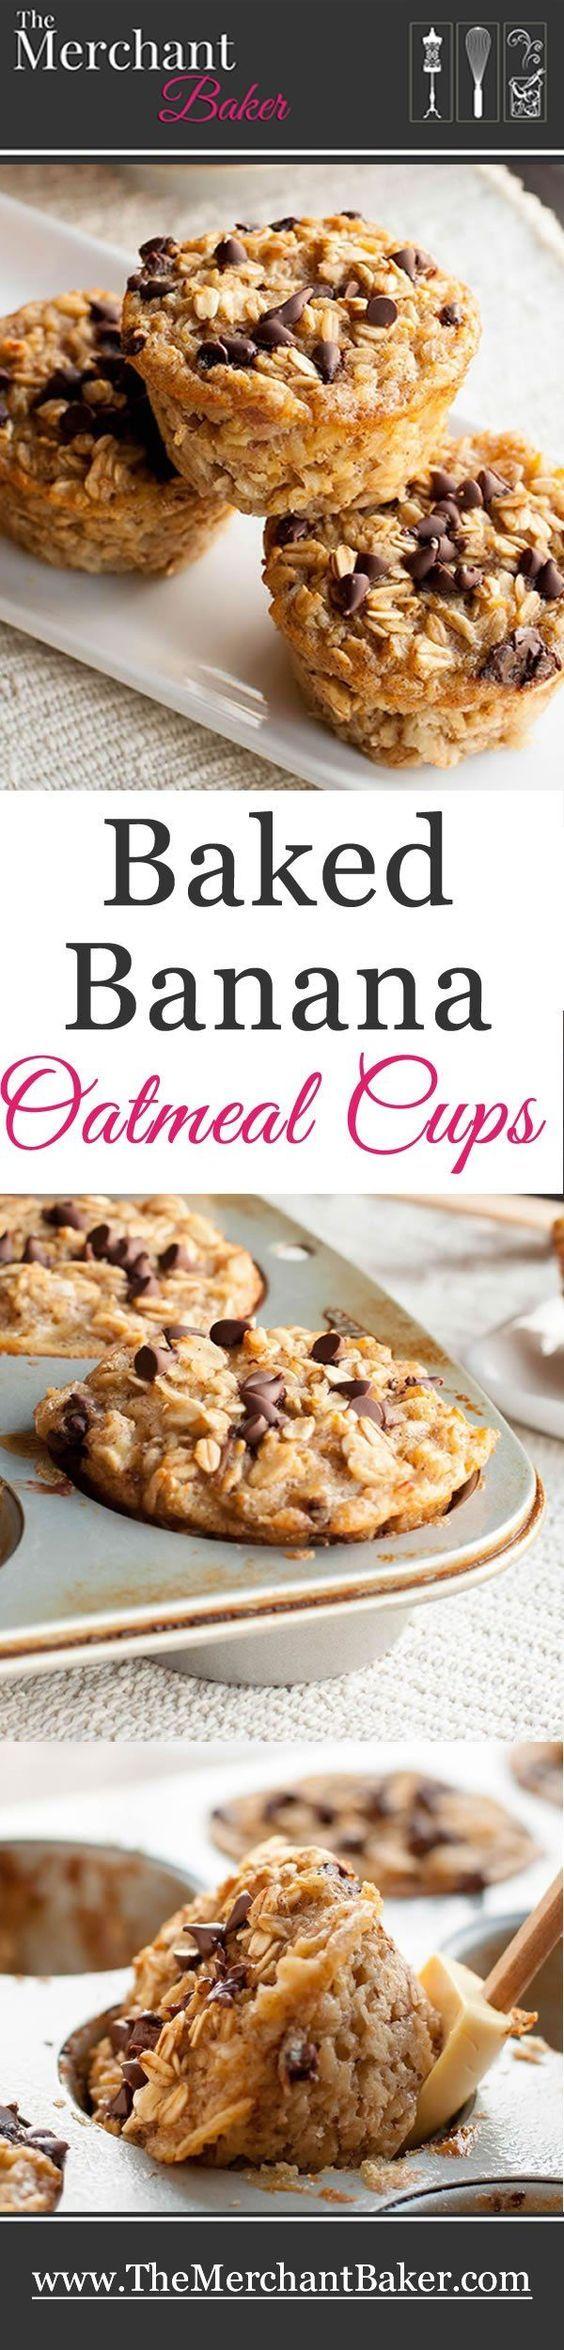 Baked Banana Oatmeal Cups Healthy Recipe Ideas Healthy Recipes Baked Banana Banana Recipes Healthy Baking